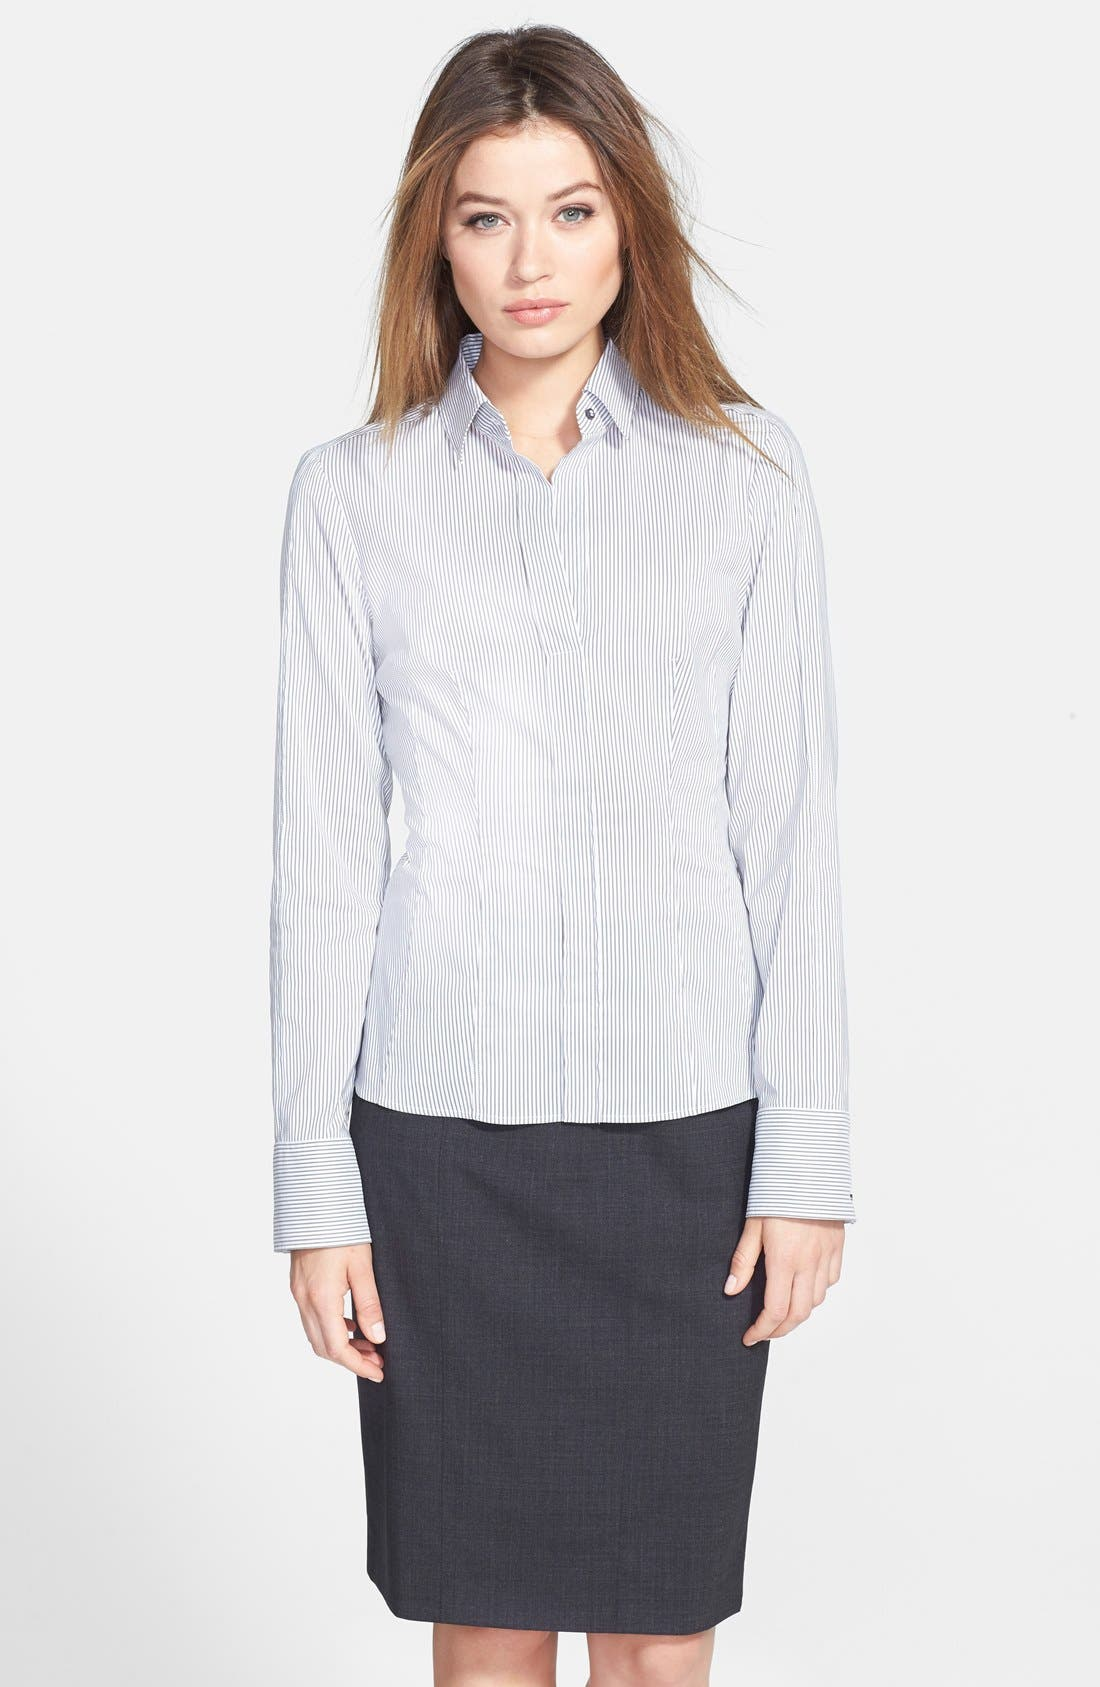 Alternate Image 1 Selected - BOSS 'Bashina' Fitted Cotton Blend Pinstripe V-Neck Blouse